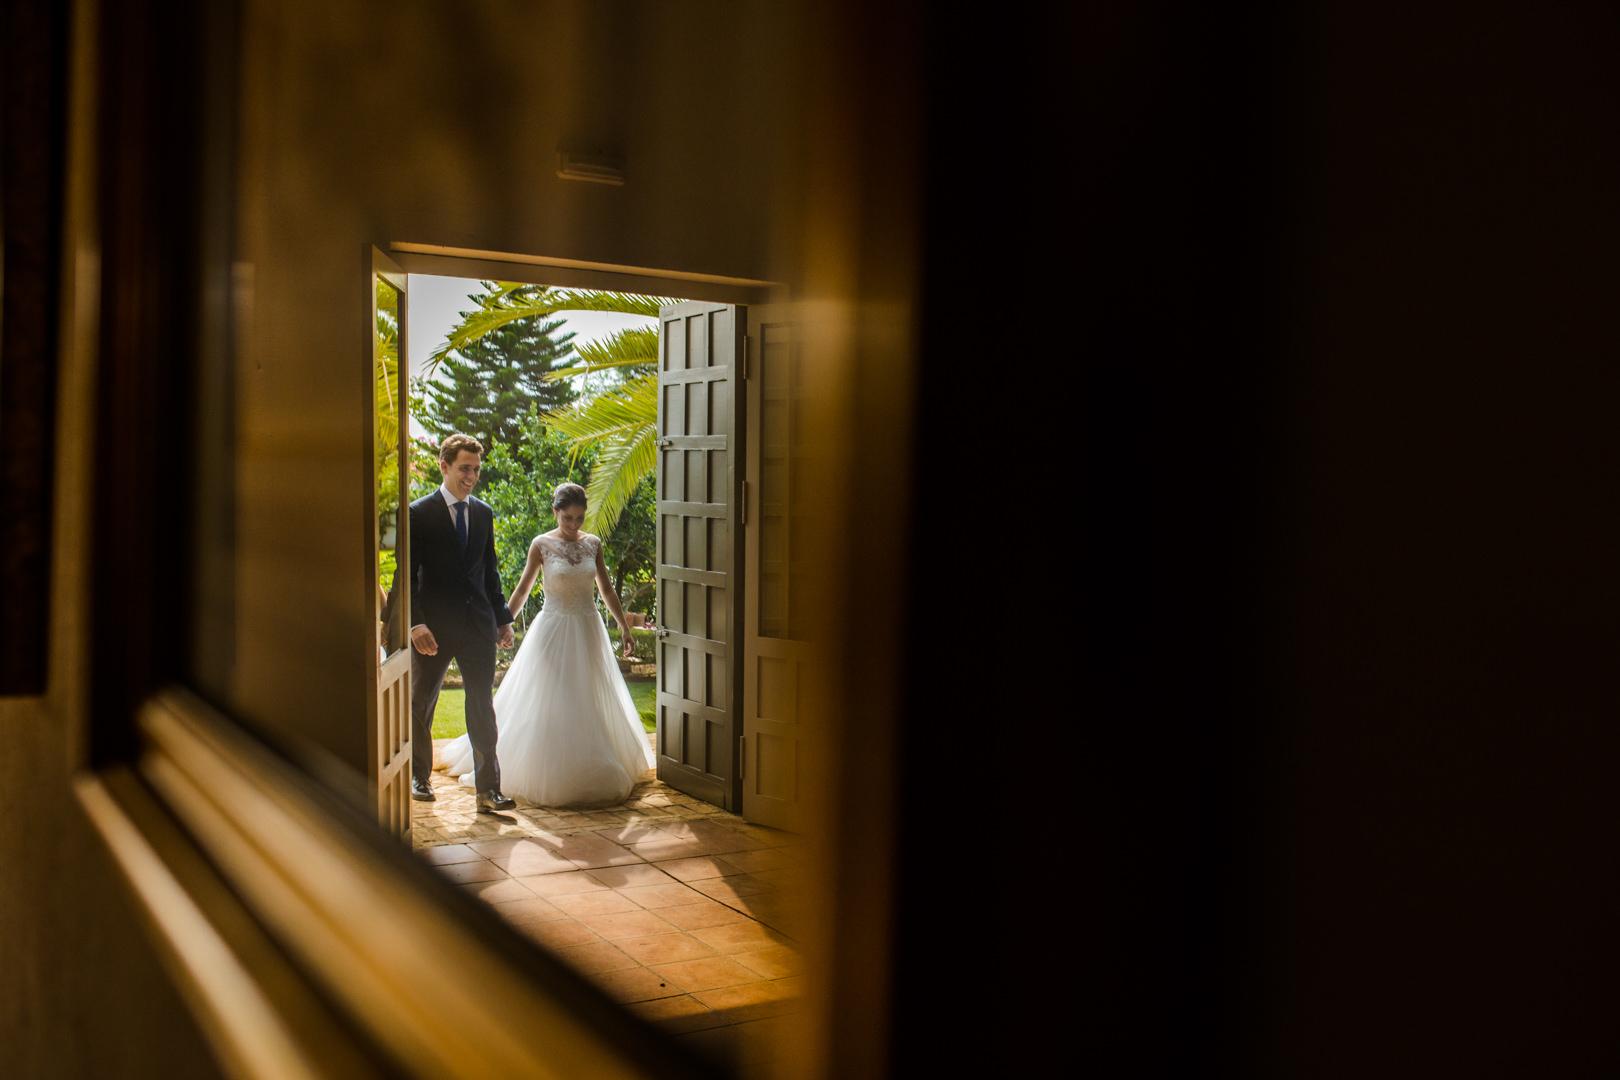 Boda-Hacienda-LOrigen-Pepe-Maria-engagement-Rafael-Torres-fotografo-bodas-sevilla-madrid-barcelona-wedding-photographer--25.jpg